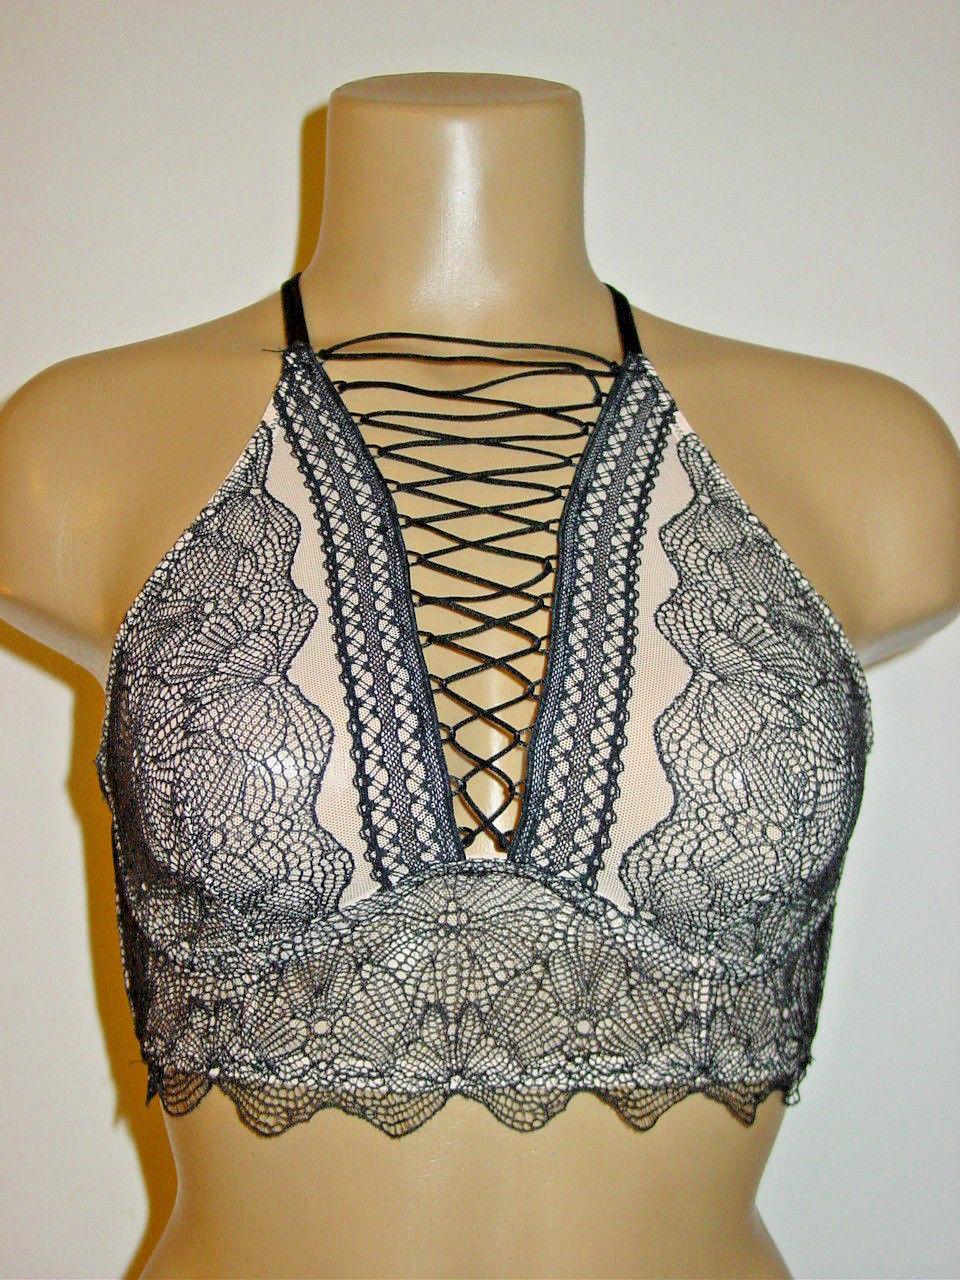 d440a48cf38 Victoria s Secret Very Sexy black bra bralette high neck lace up front-S-NEW